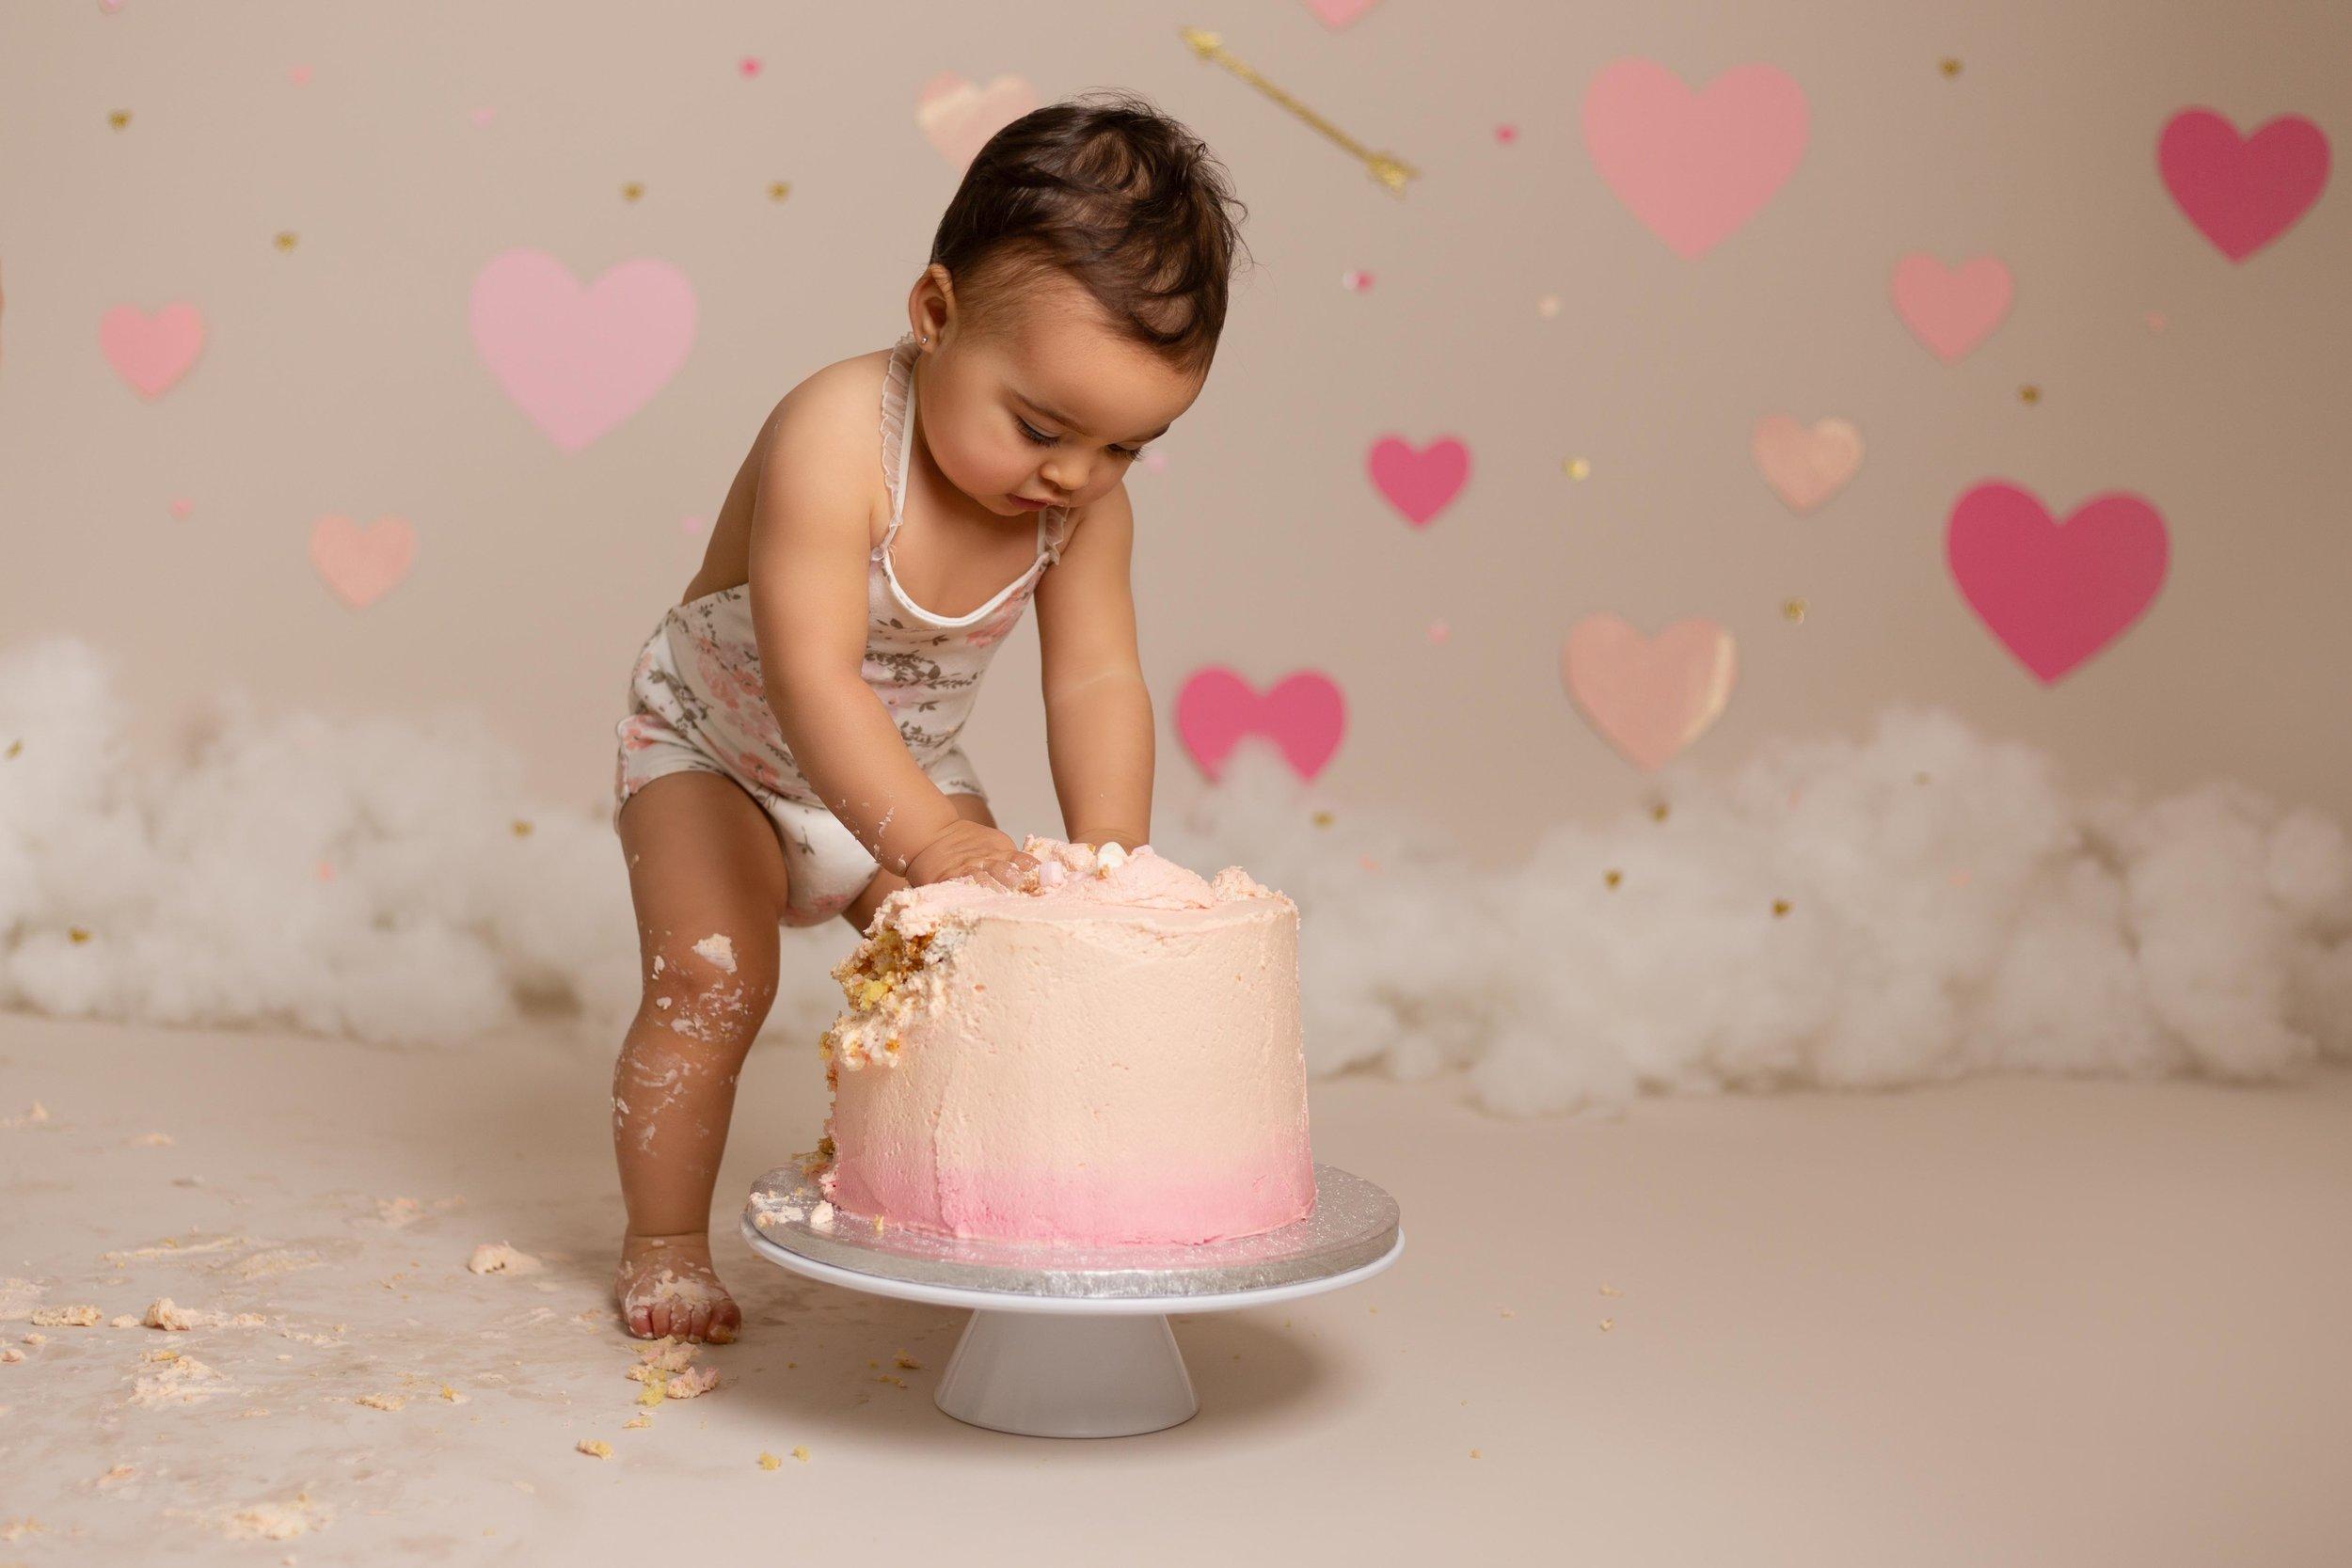 Lea-cooper-photography-cake-smash-photographer-1st-birthday-photos-willenhall-wolverhampton-west-midlands-birmingham-valentines-day-19.jpg